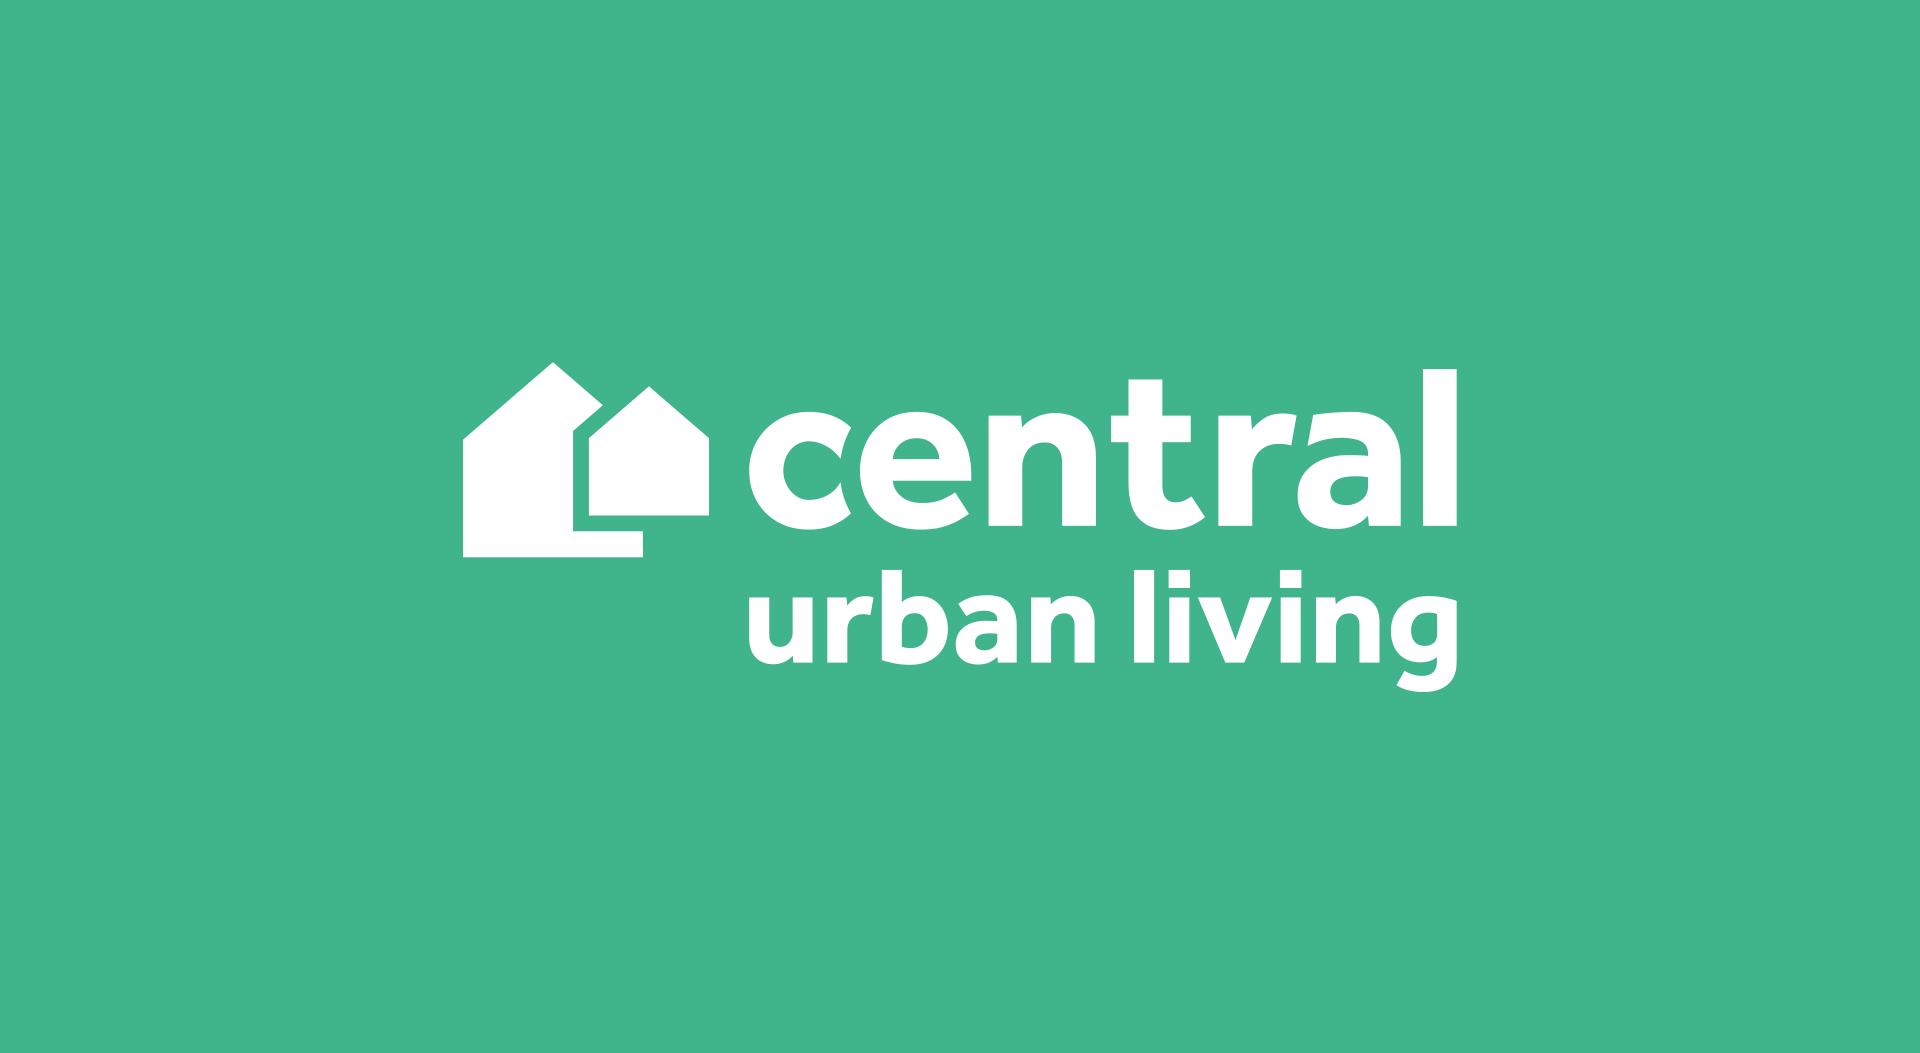 Central Urban Living logo design in white